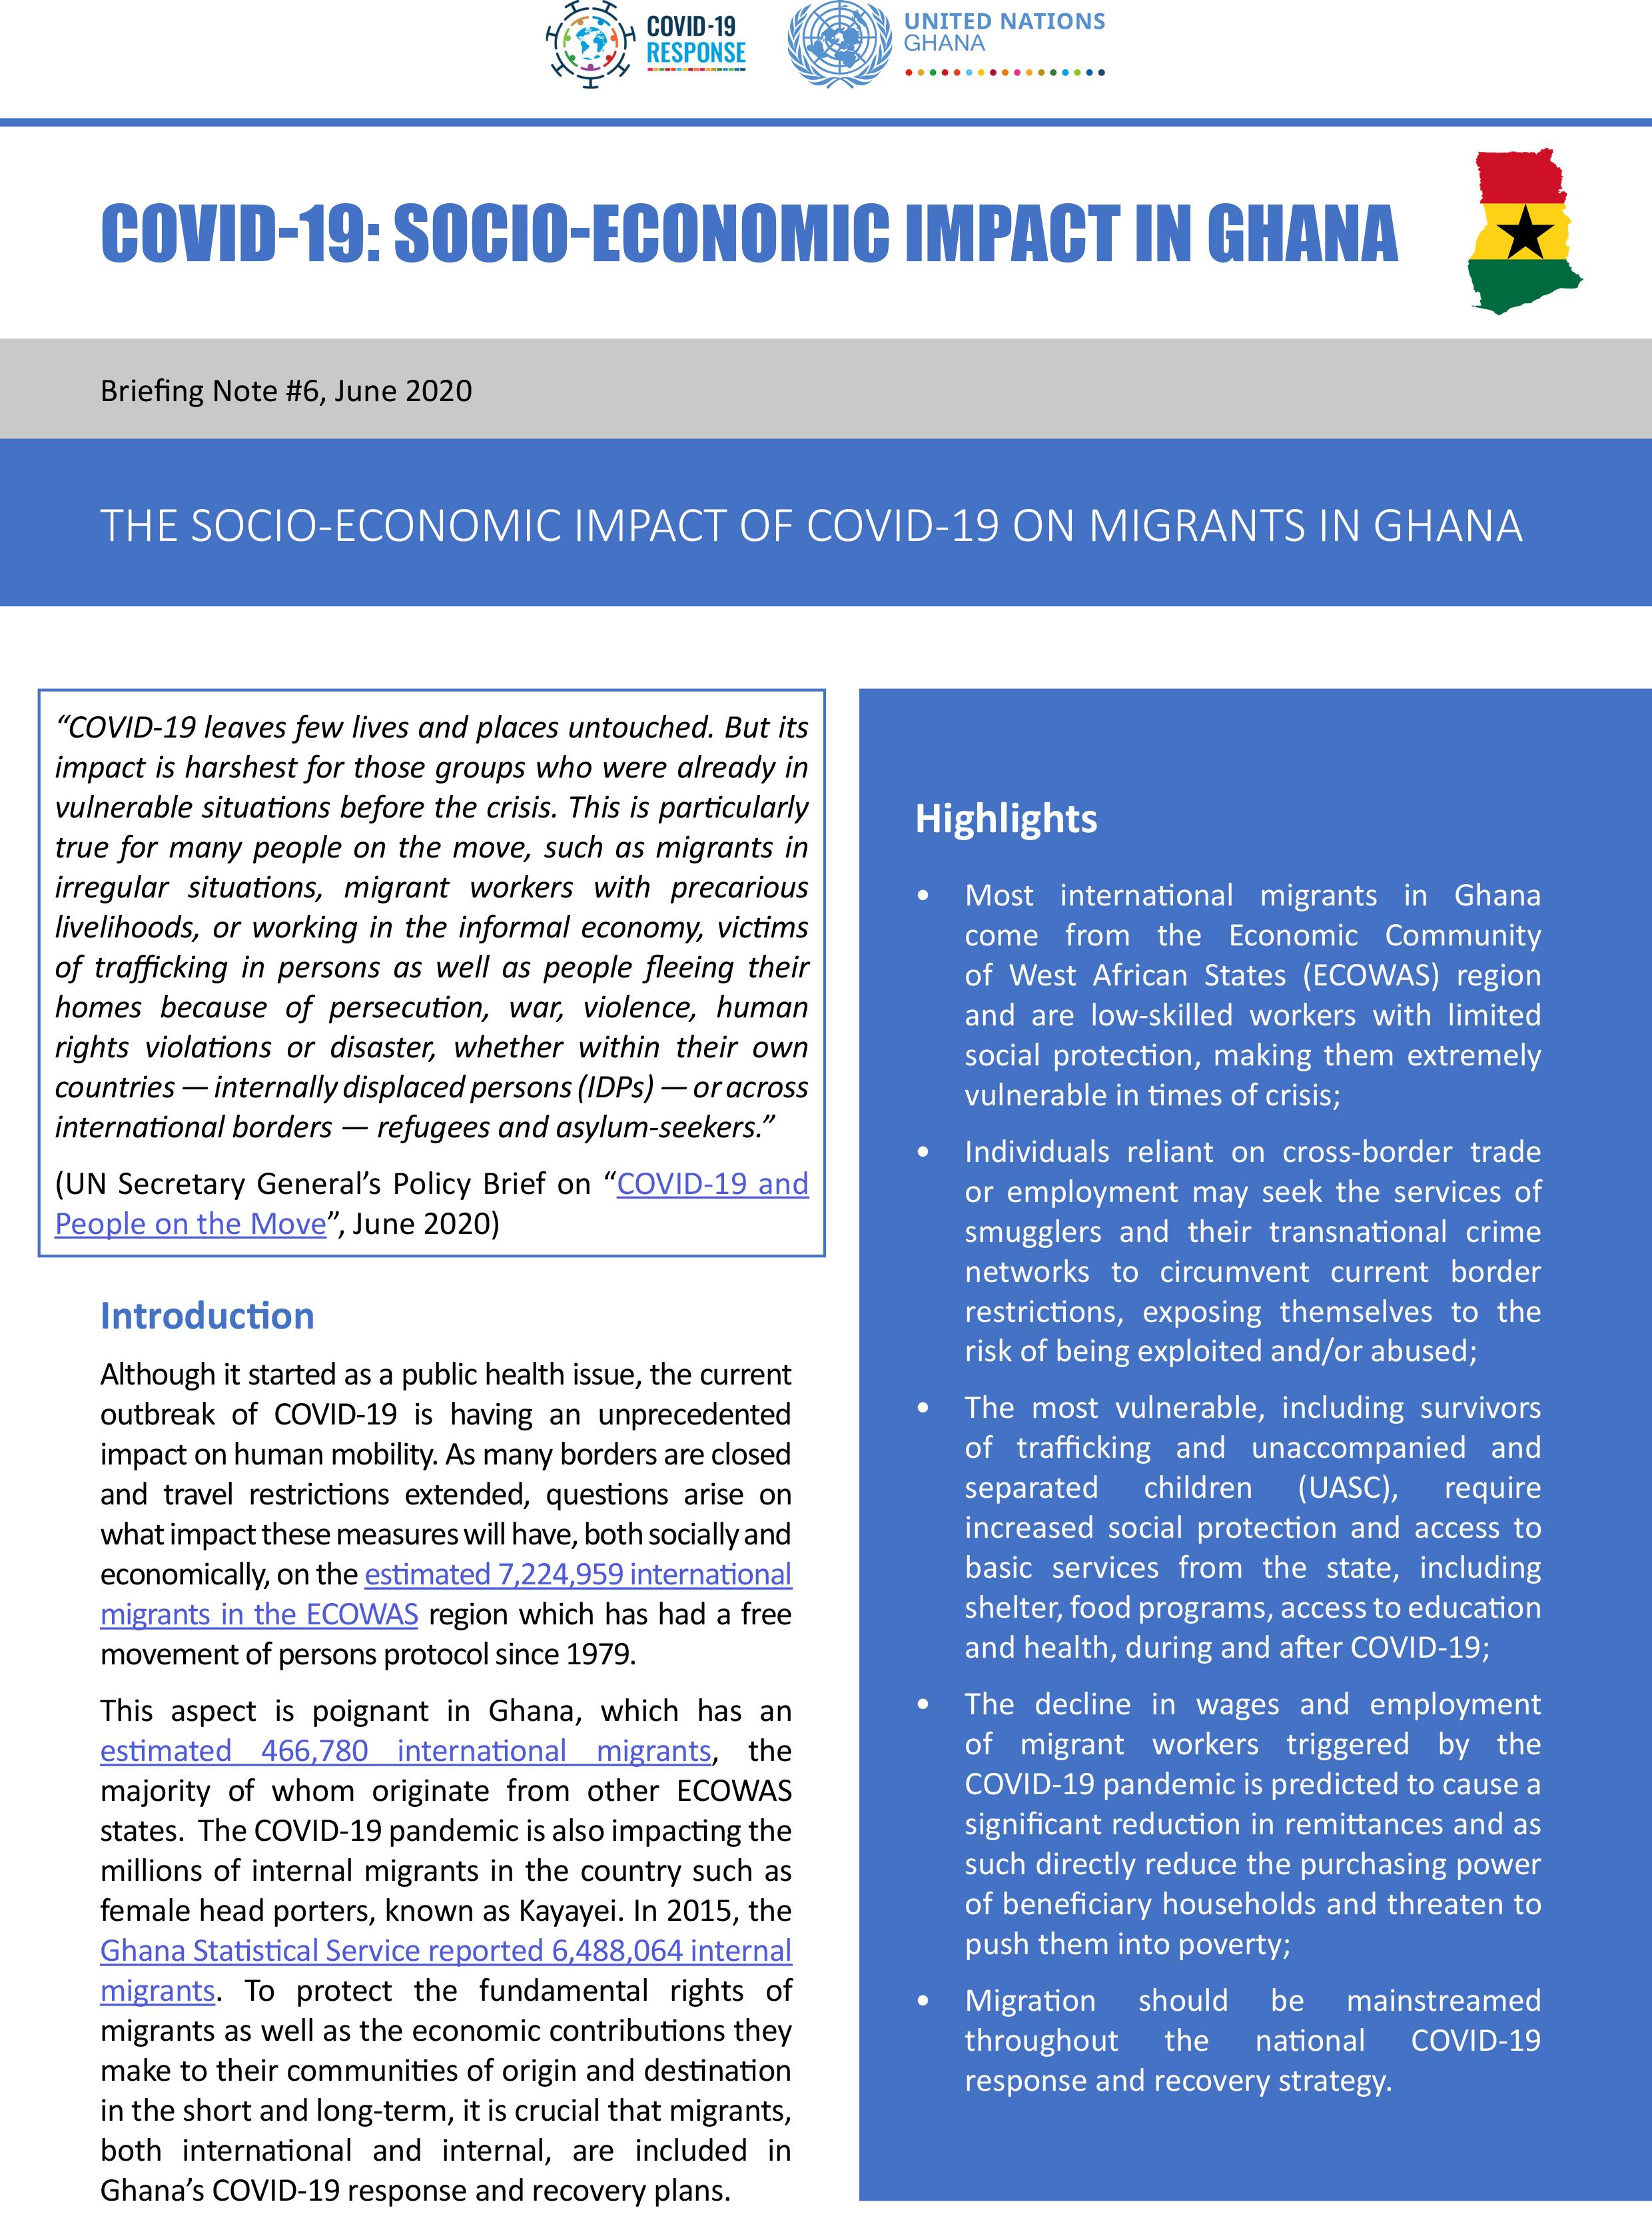 The Socio-Economic Impact of COVID-19 on Migrants in Ghana